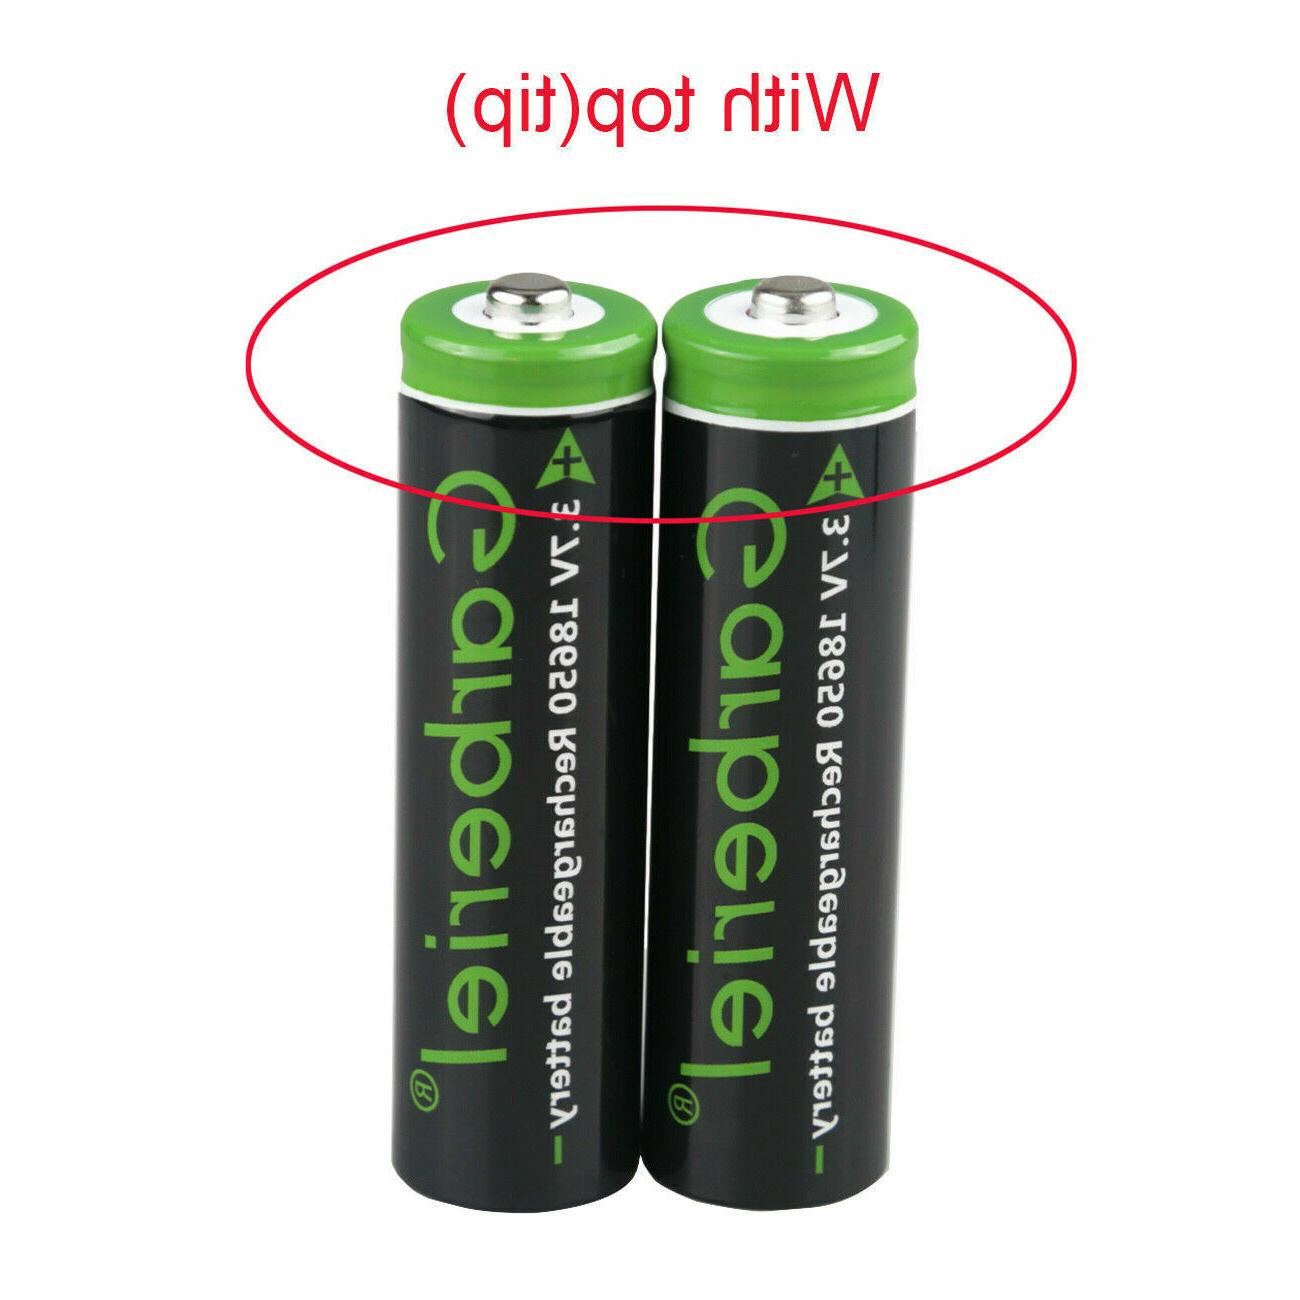 T6 LED 18650 Li-ion Batteries +Dual